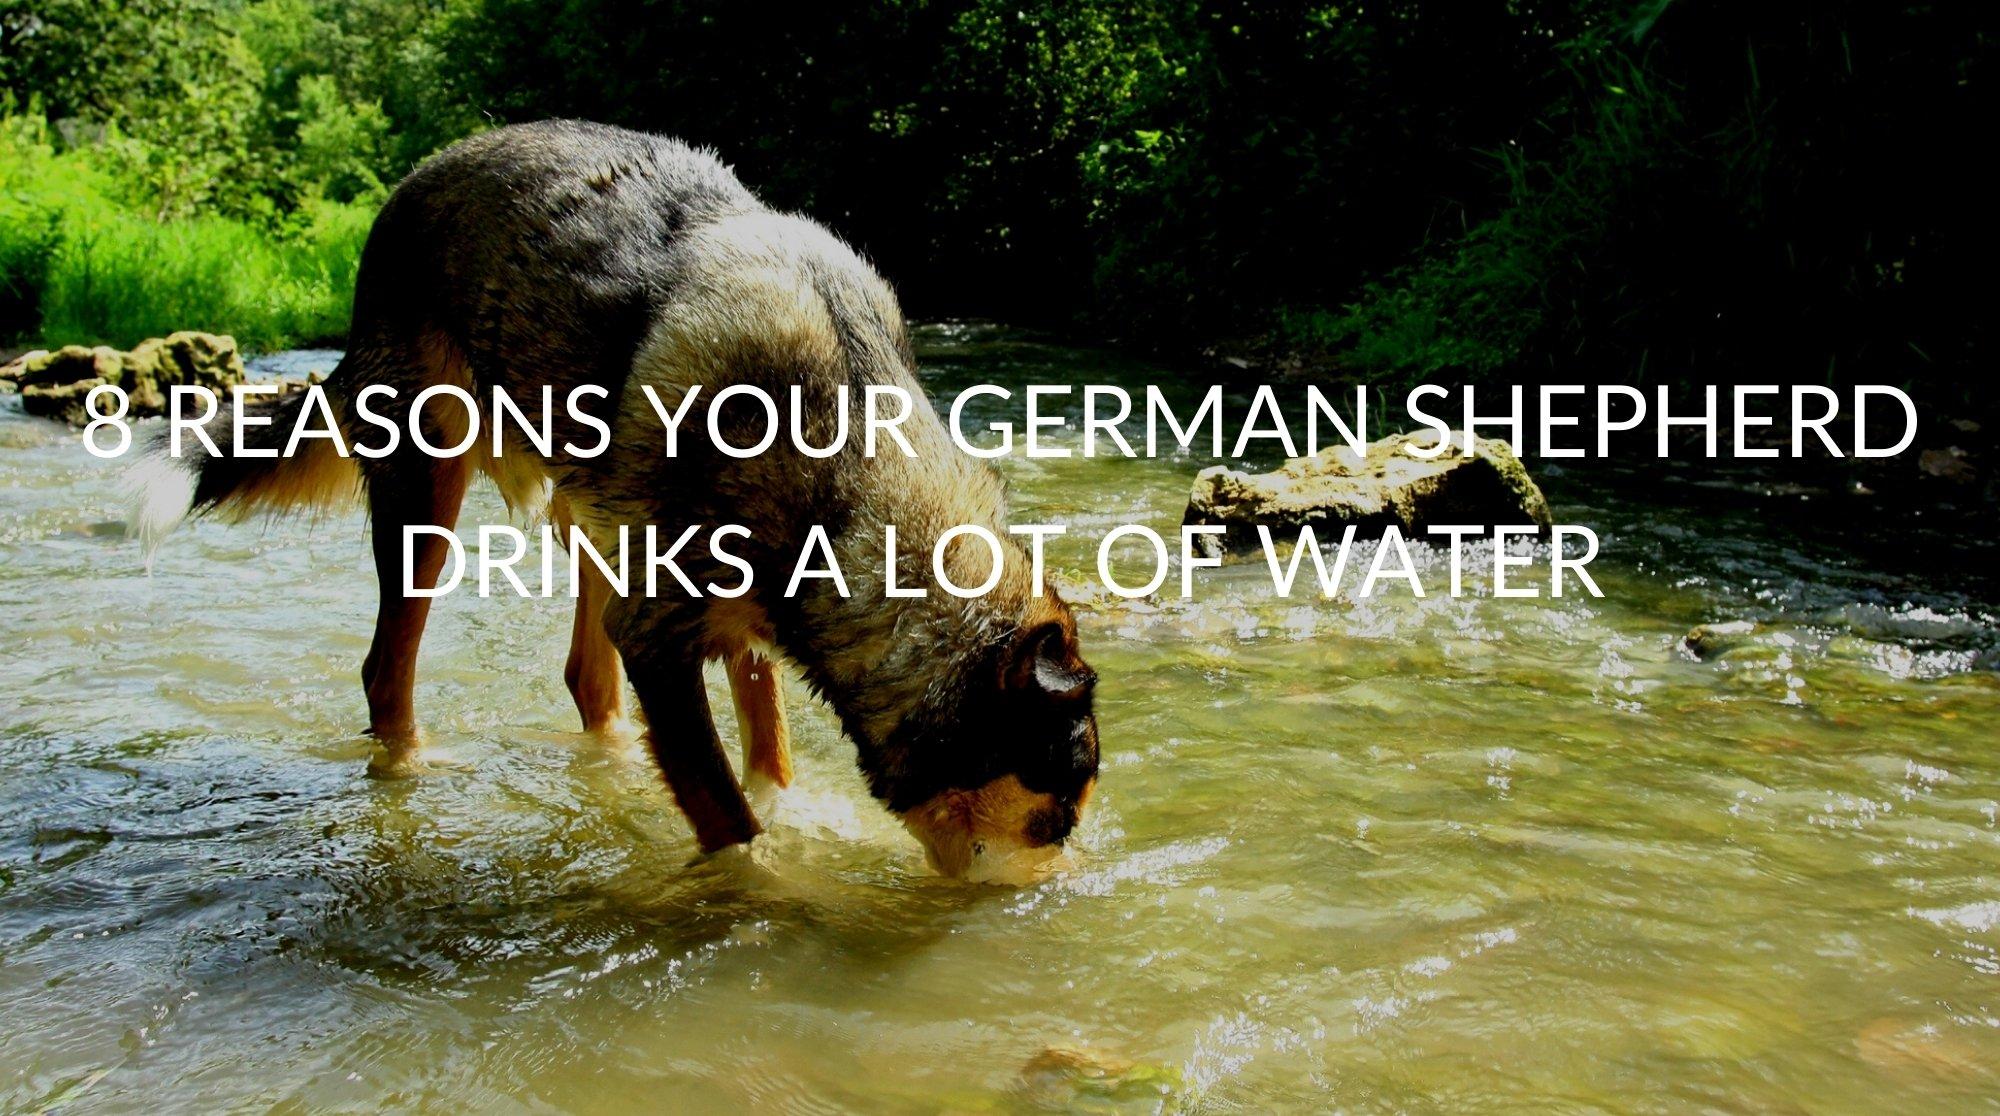 8 Reasons Your German Shepherd Drinks A Lot Of Water